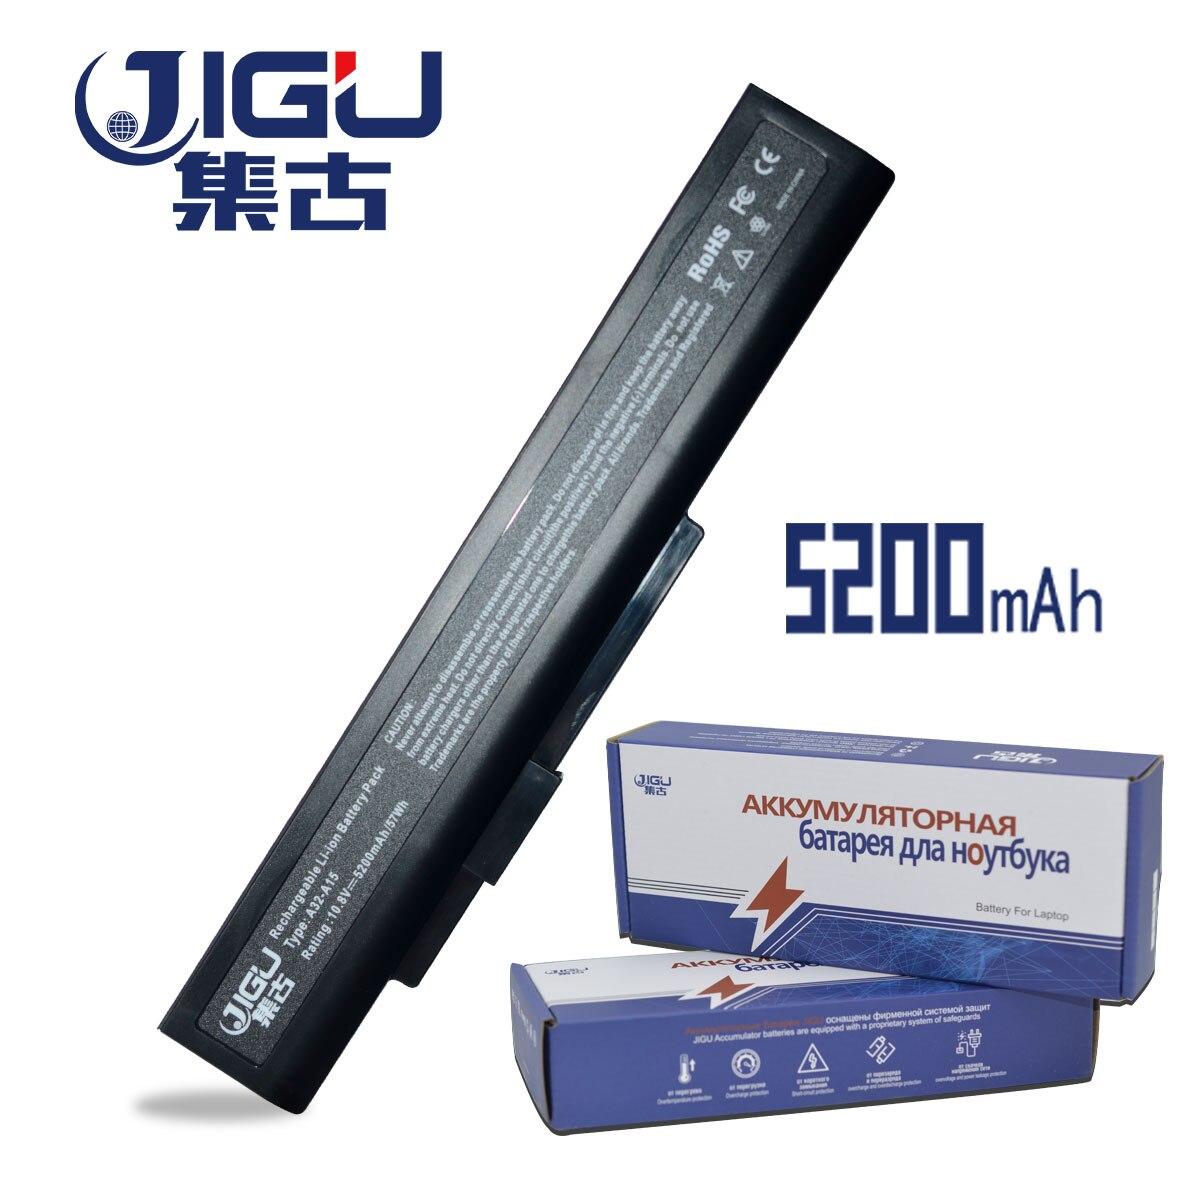 JIGU 5200MAH Laptop Battery A32-A15 A42-A15 A31-A15 FOR MSI CR640 CR640X CX640 CR640MX CR640DX For FUJITSU Lifebook N532 NH532 цена